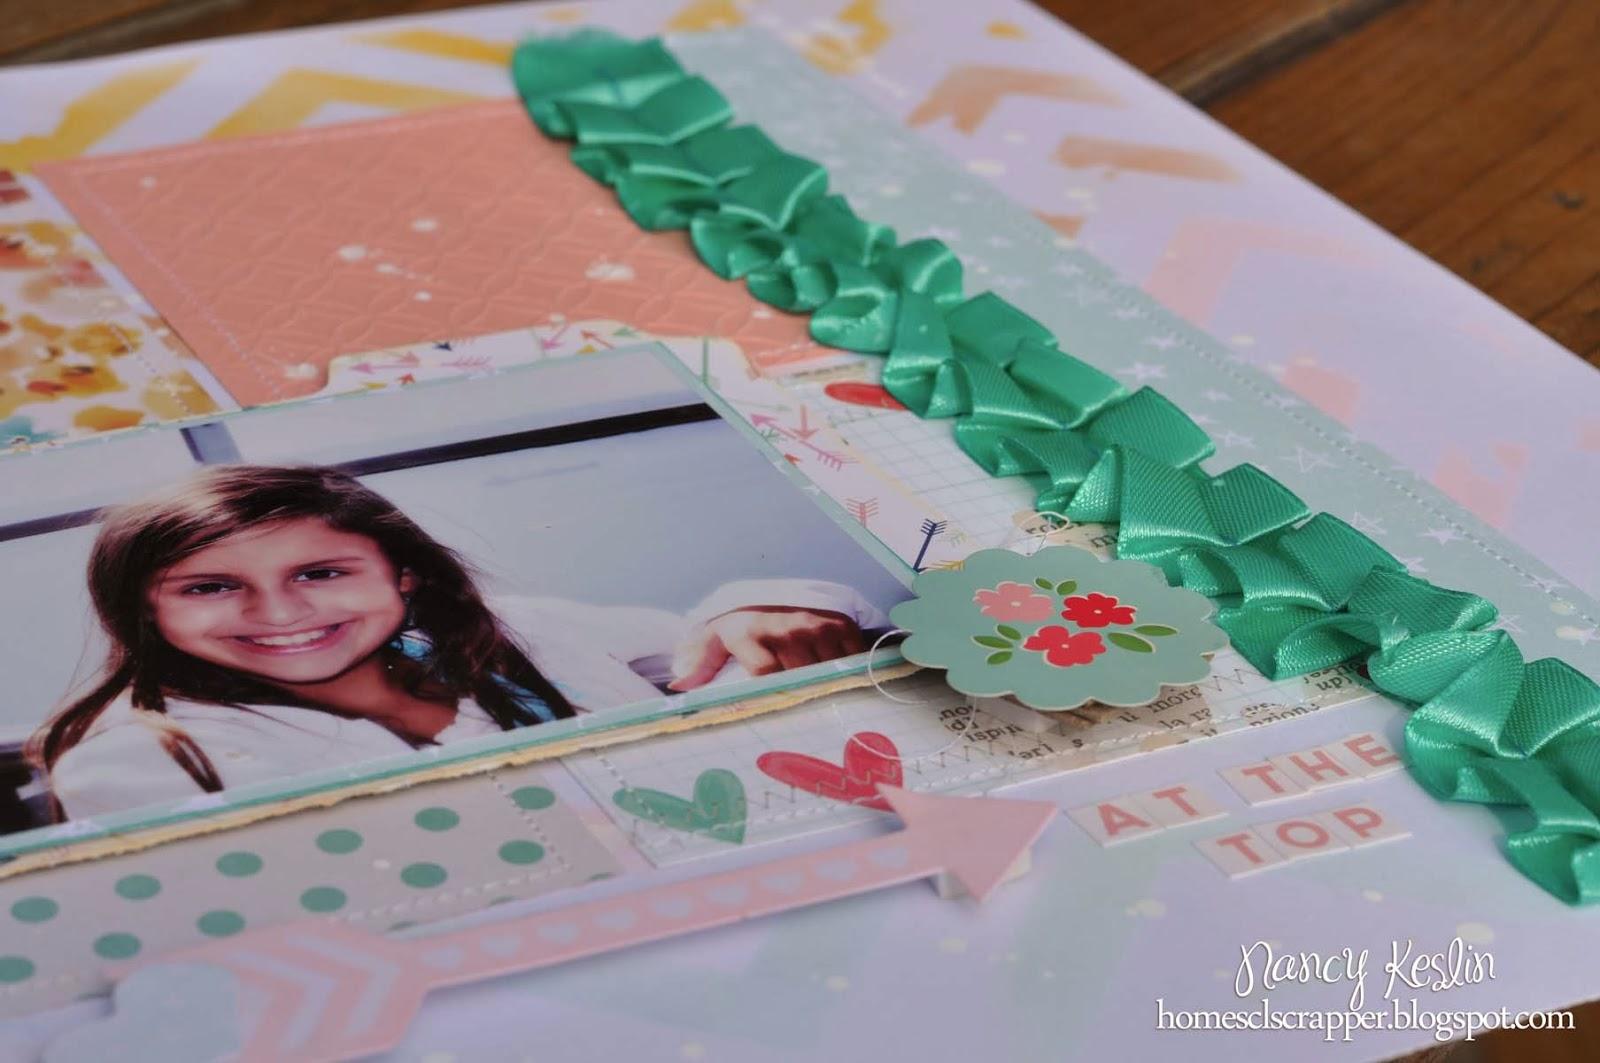 kit club, ribbon, pan pastel, scrapbook, 12x12